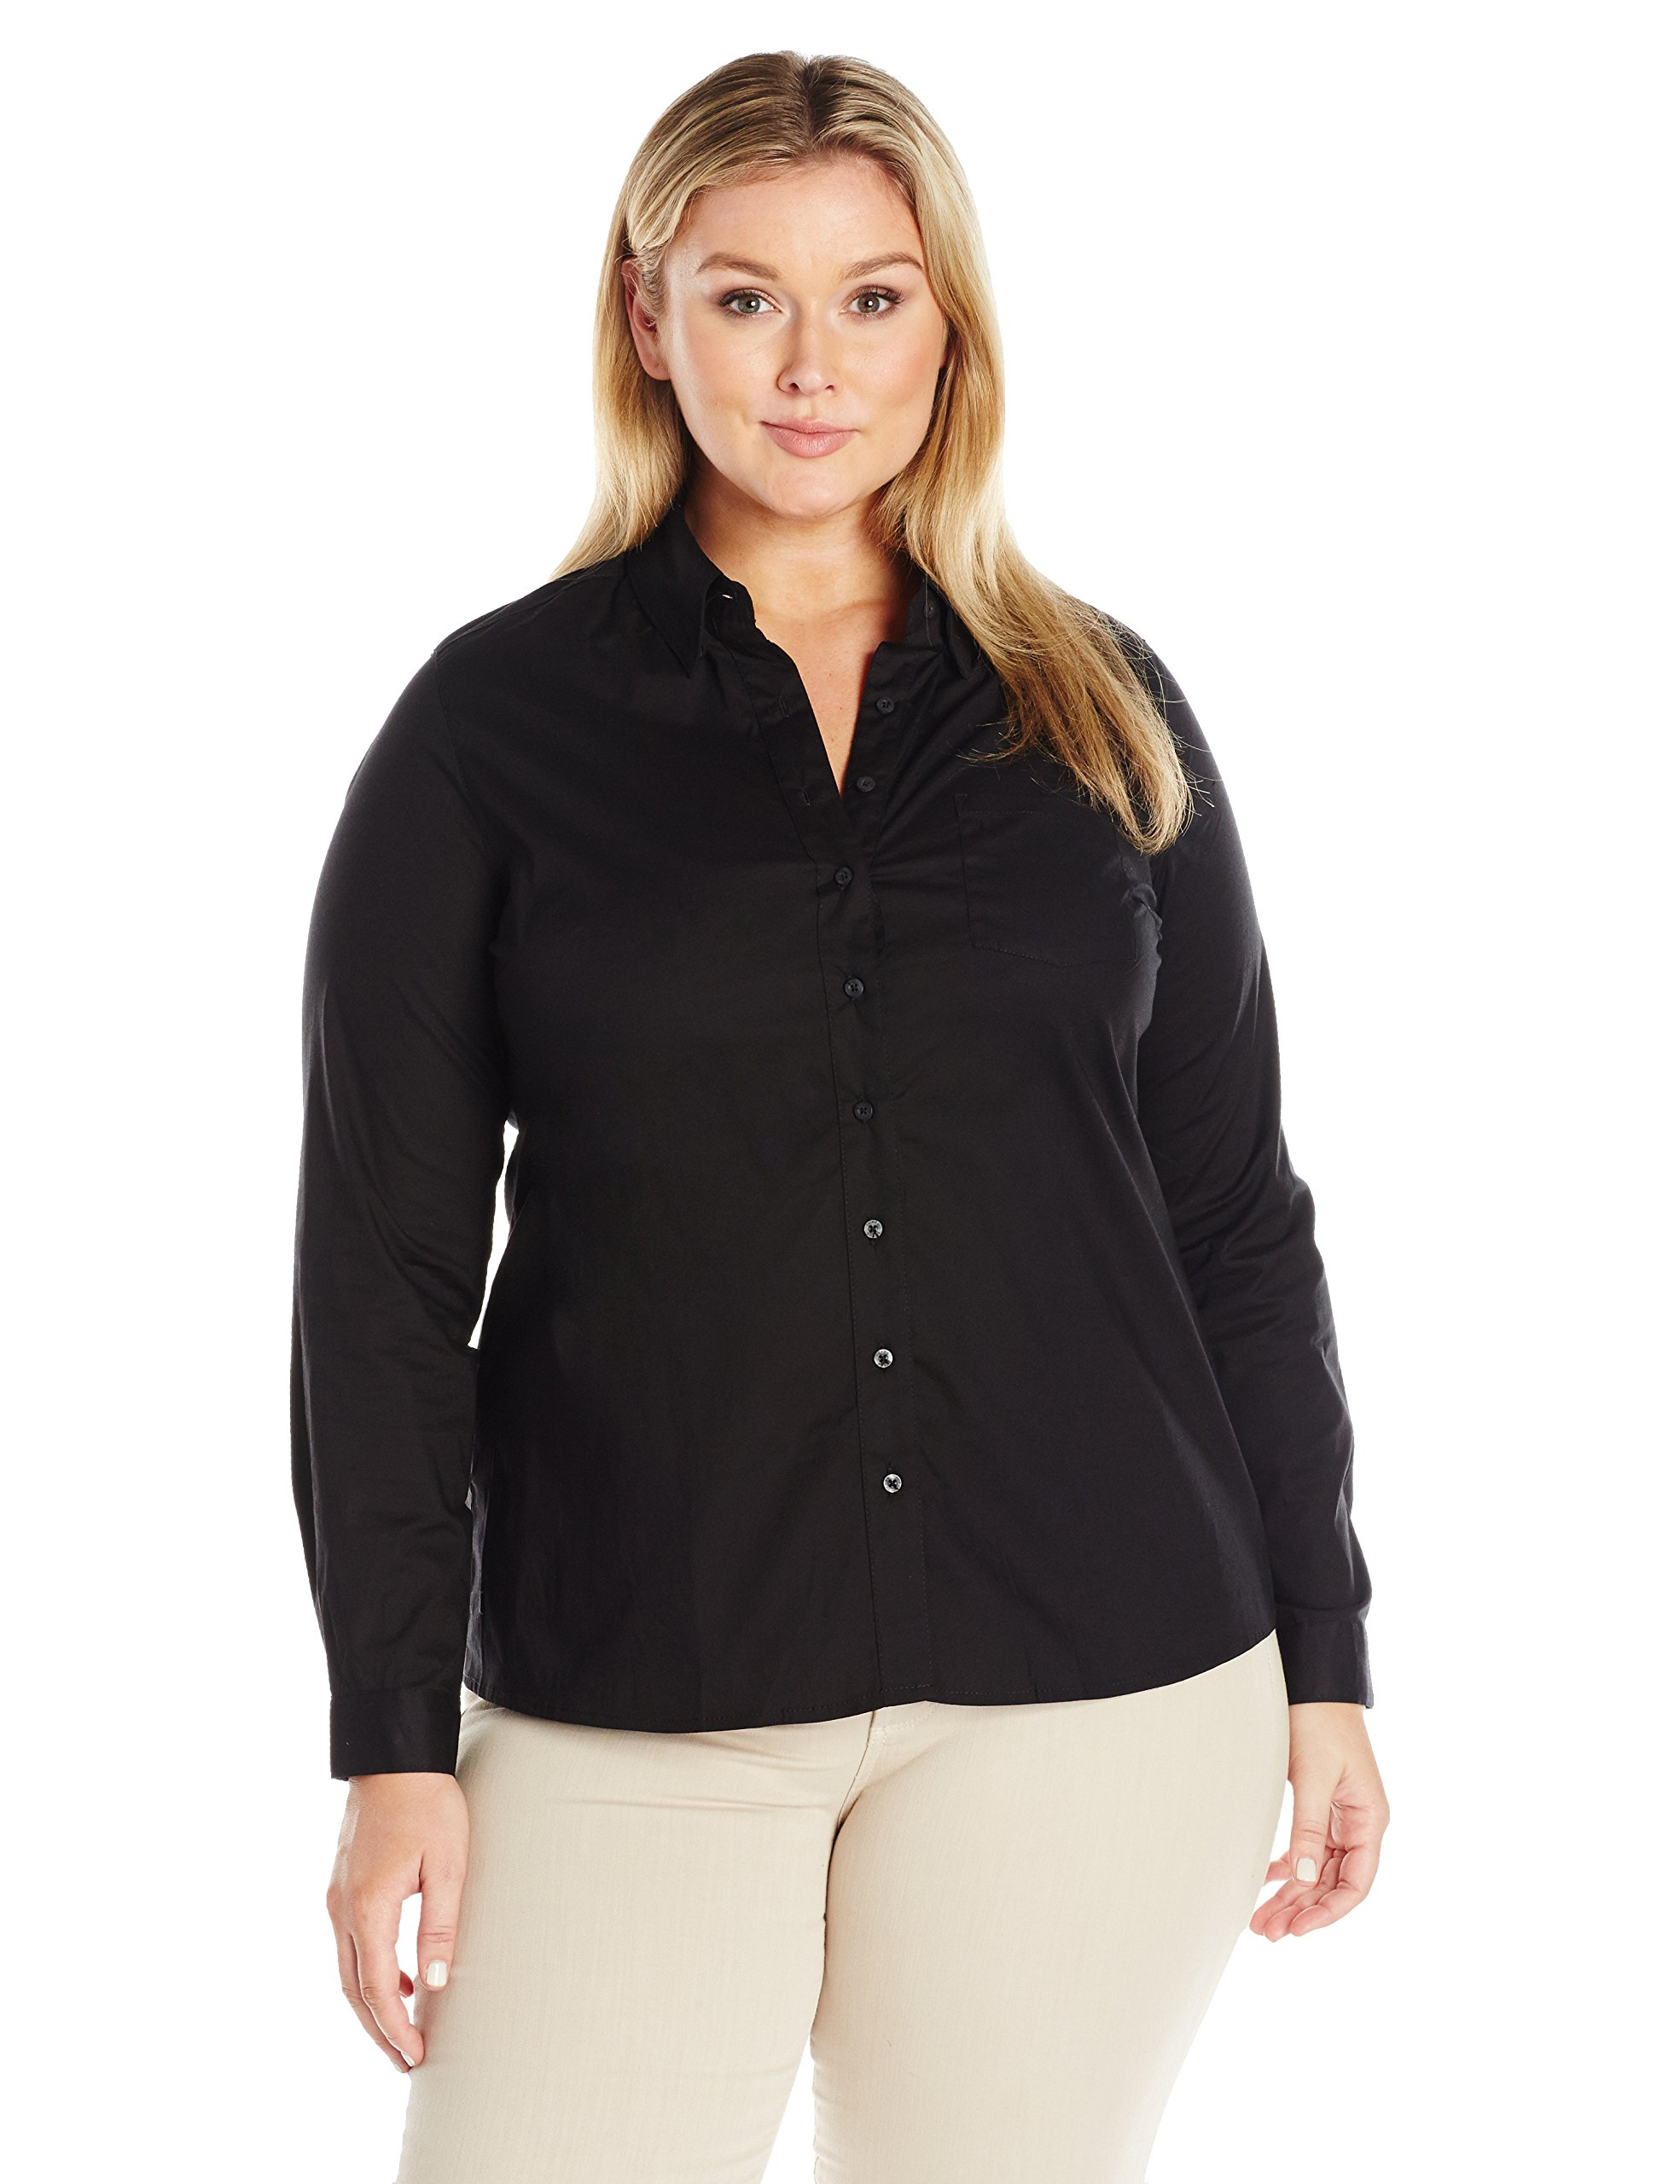 Dickies Girl Juniors Plus Size Long Sleeve Shirt, Black, 1X